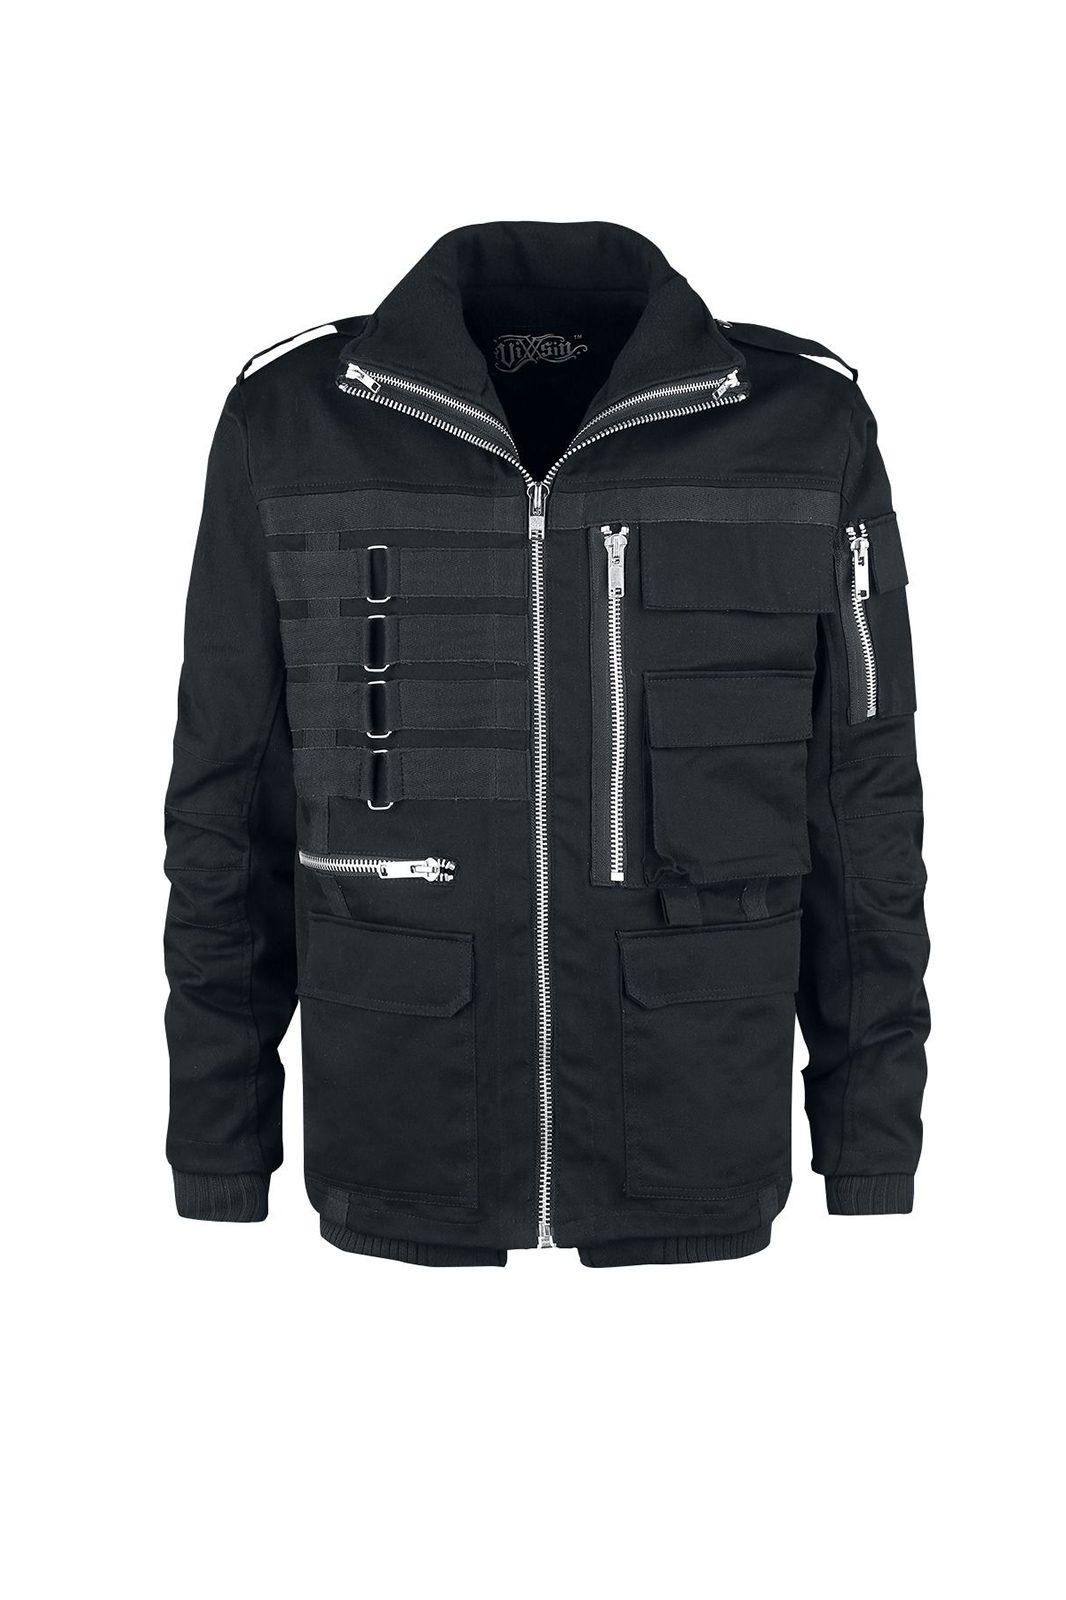 M6V Jacket Black